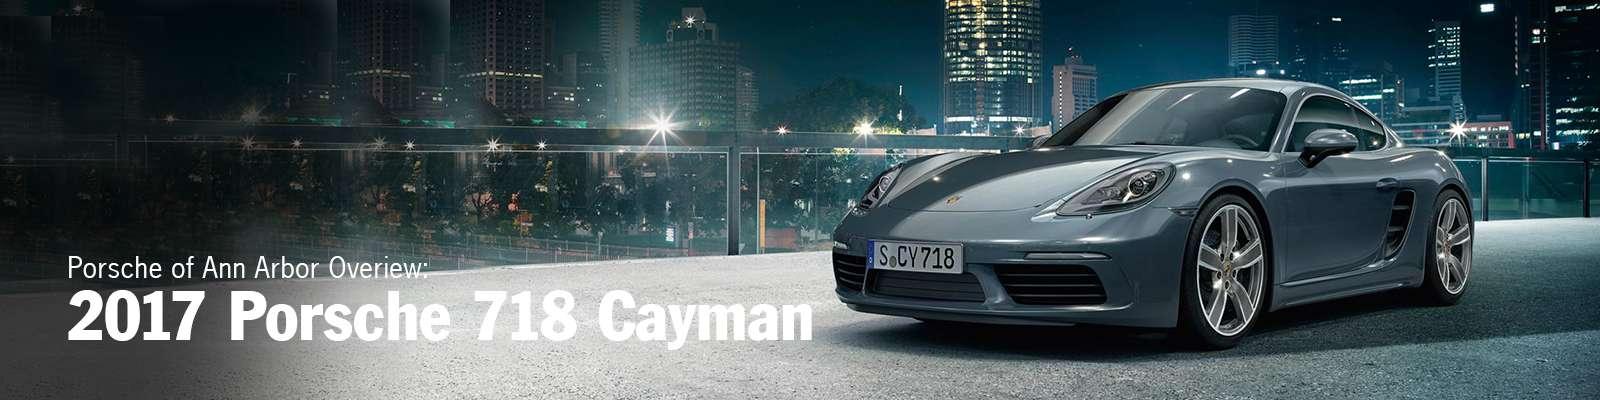 2017 Porsche 718 Cayman in Michigan